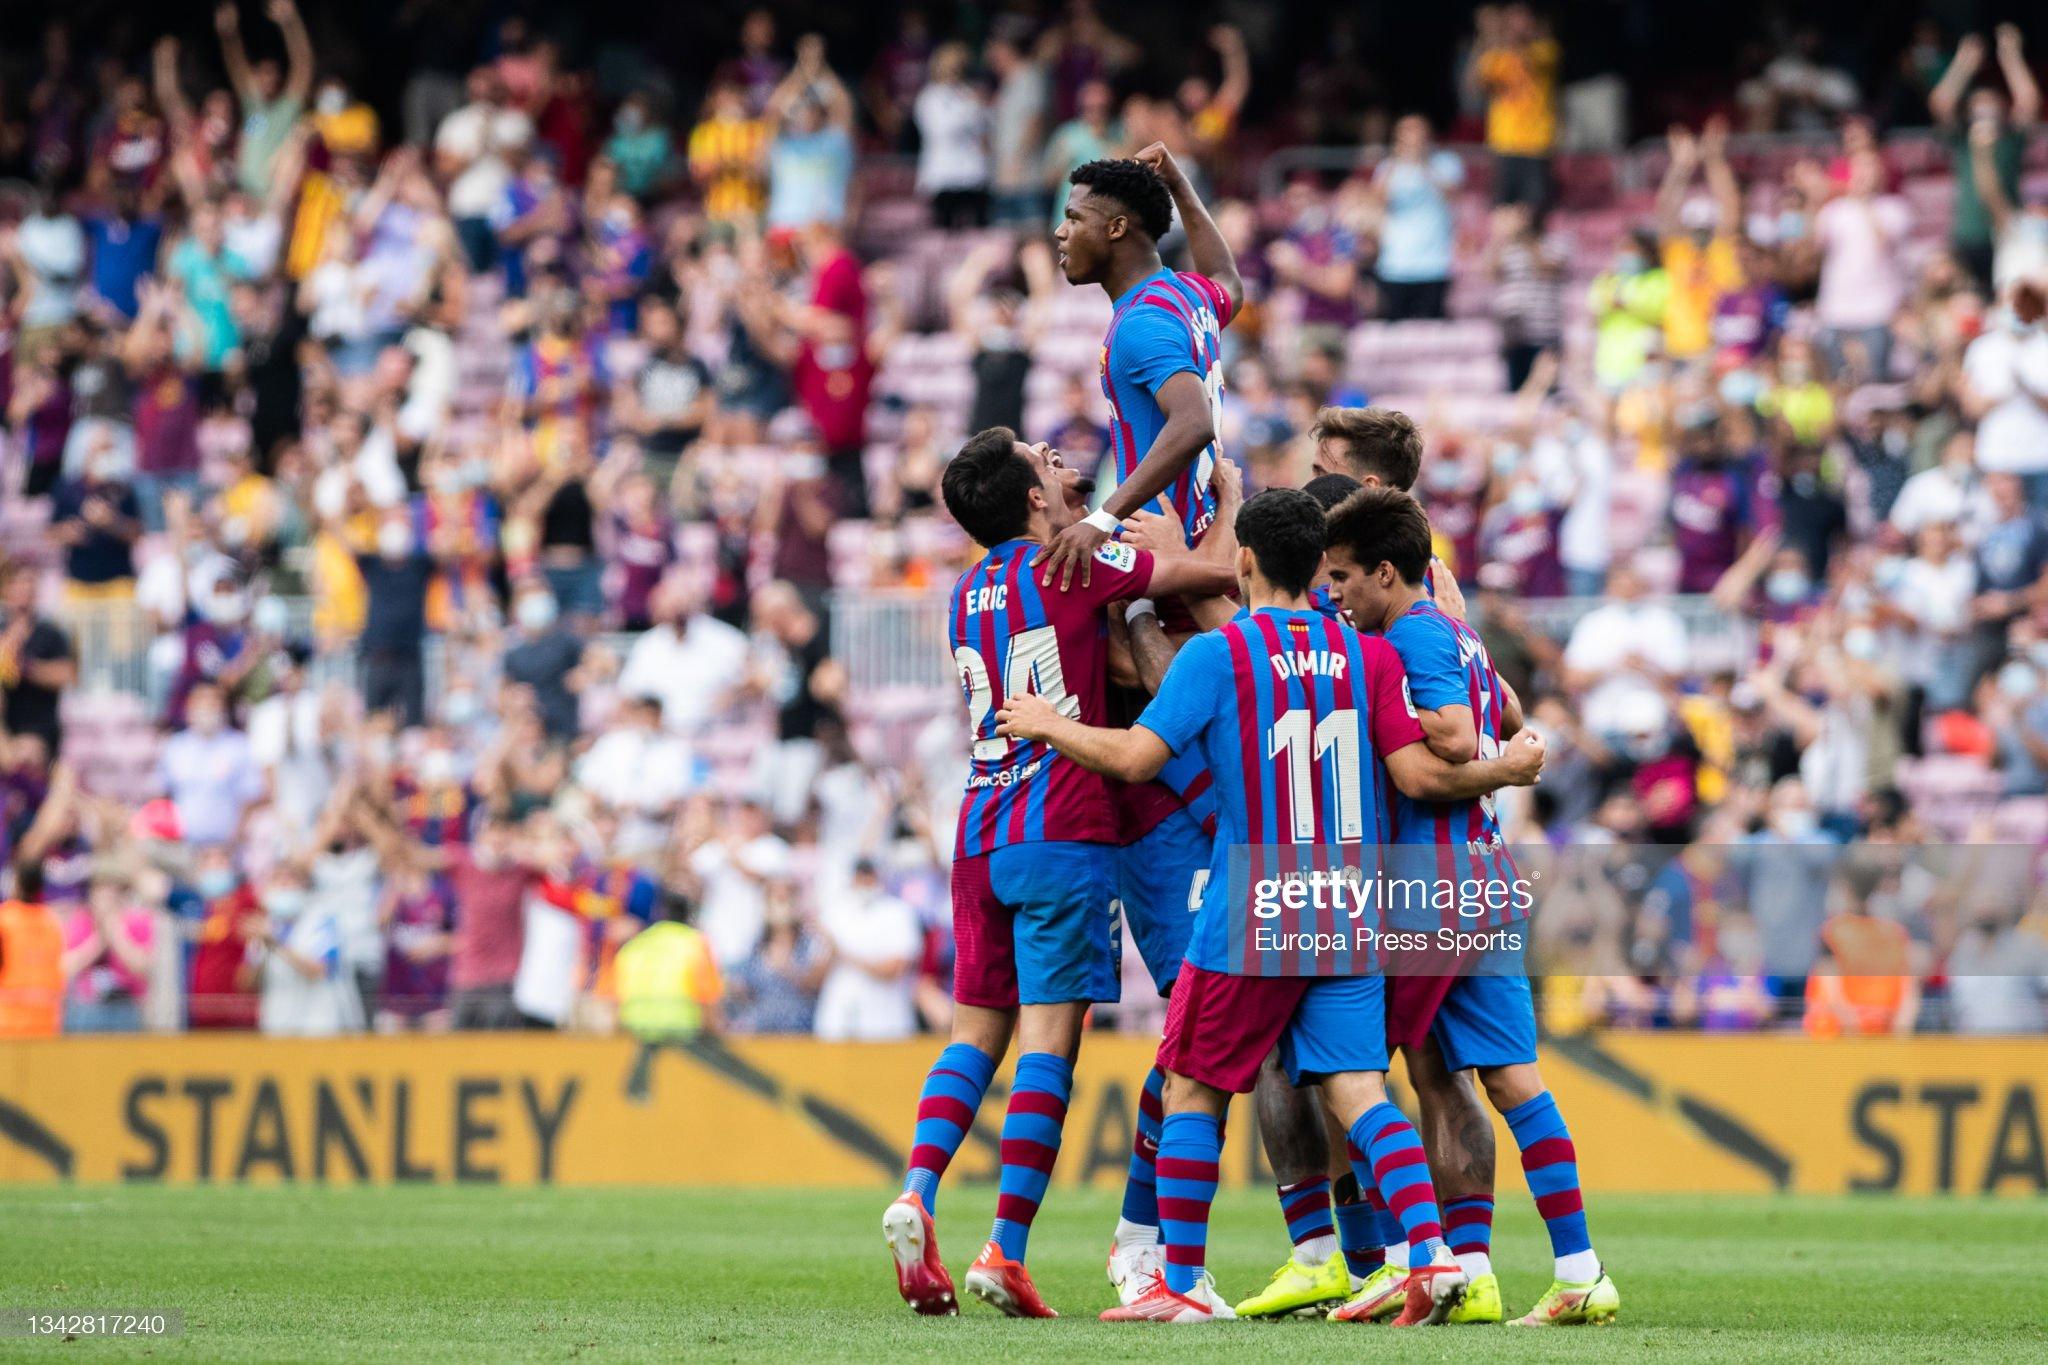 Ansu Fati - Page 3 Ansu-fati-of-fc-barcelona-celebrates-a-goal-during-the-spanish-league-picture-id1342817240?s=2048x2048